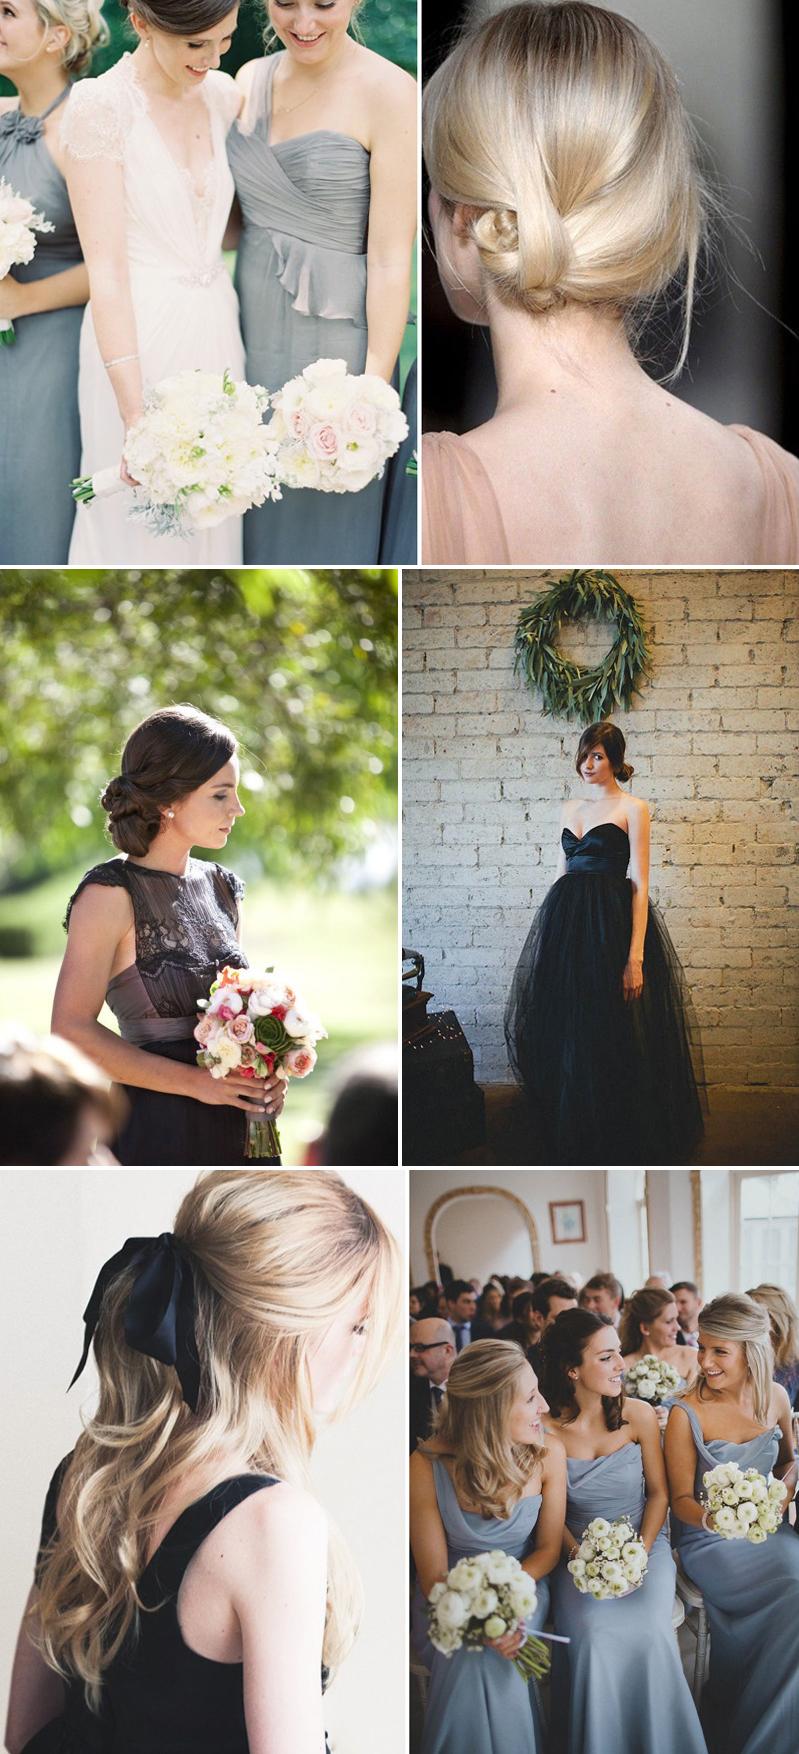 Coco Wedding Venues - Classic Elegance - Wedding Style Category - Bridesmaids.